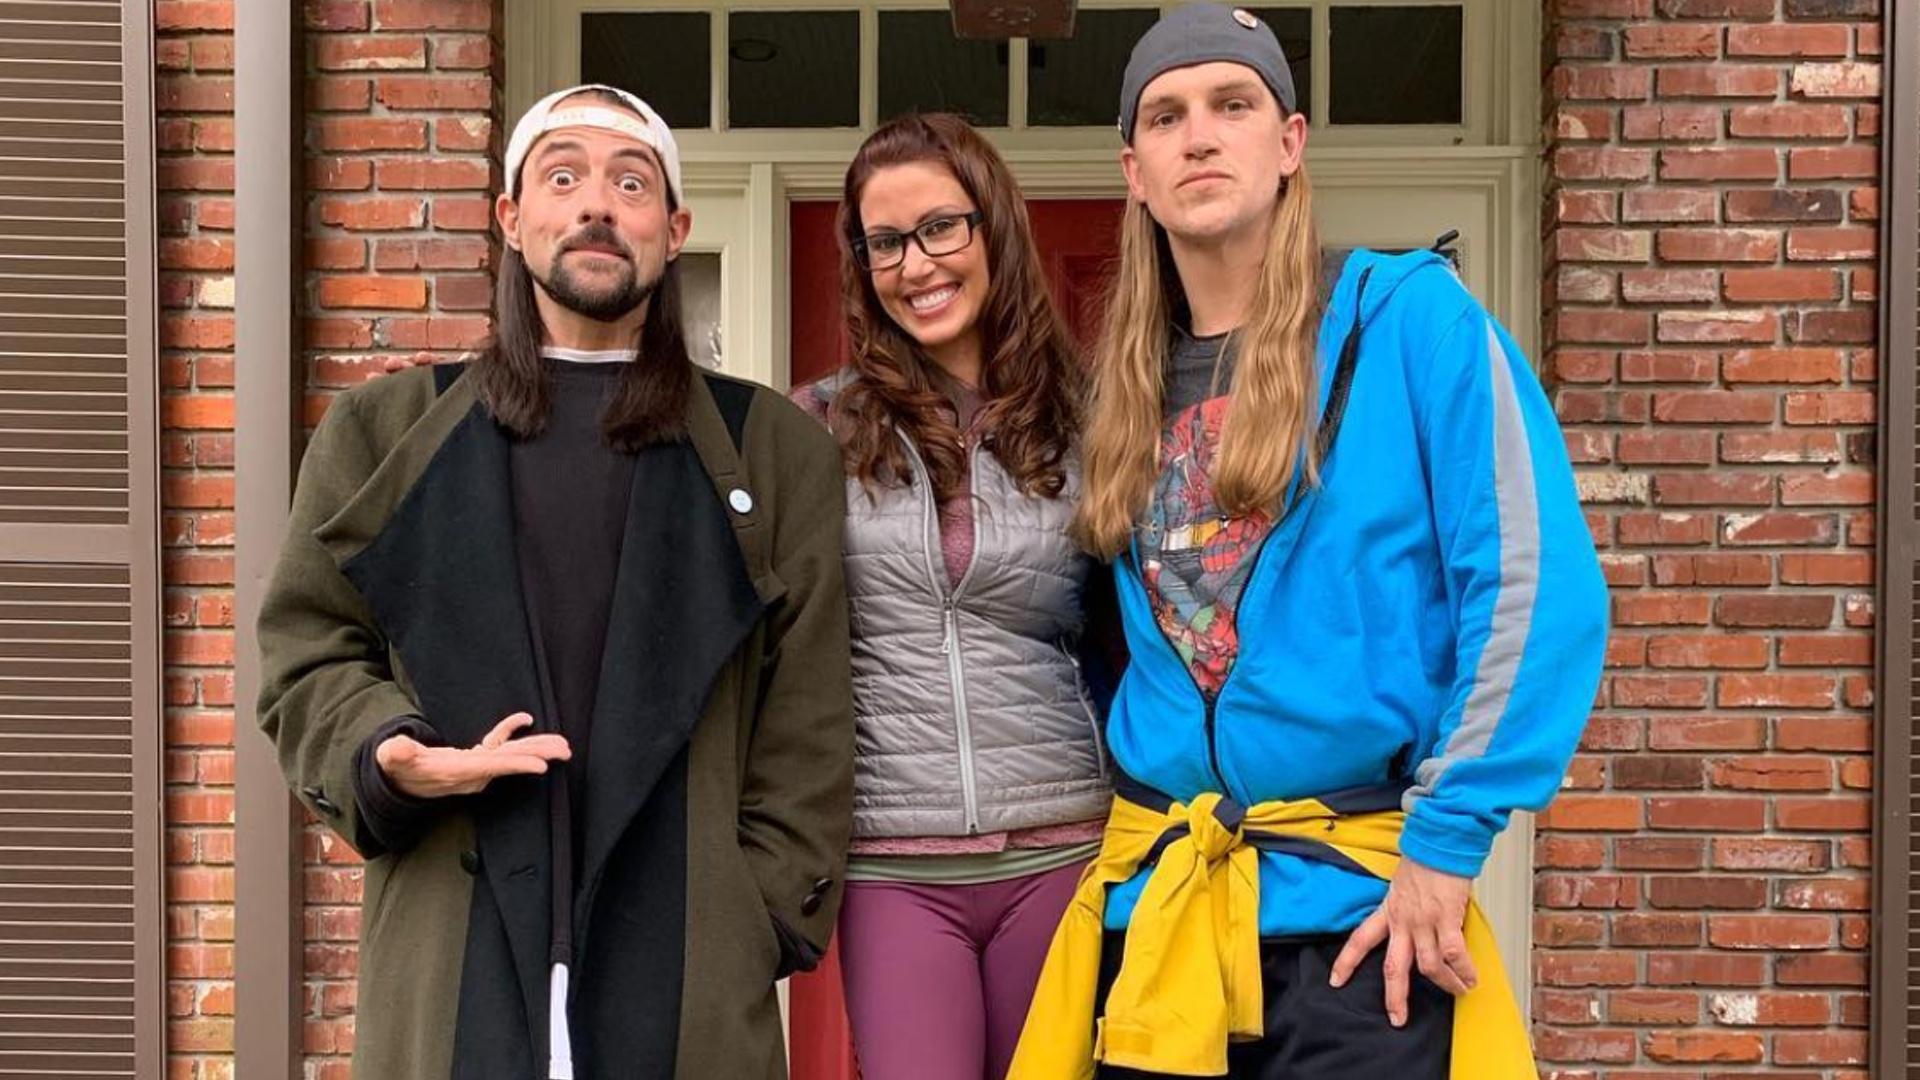 Shannon Elizabeth is back - Jay and Silent Bob reboot film